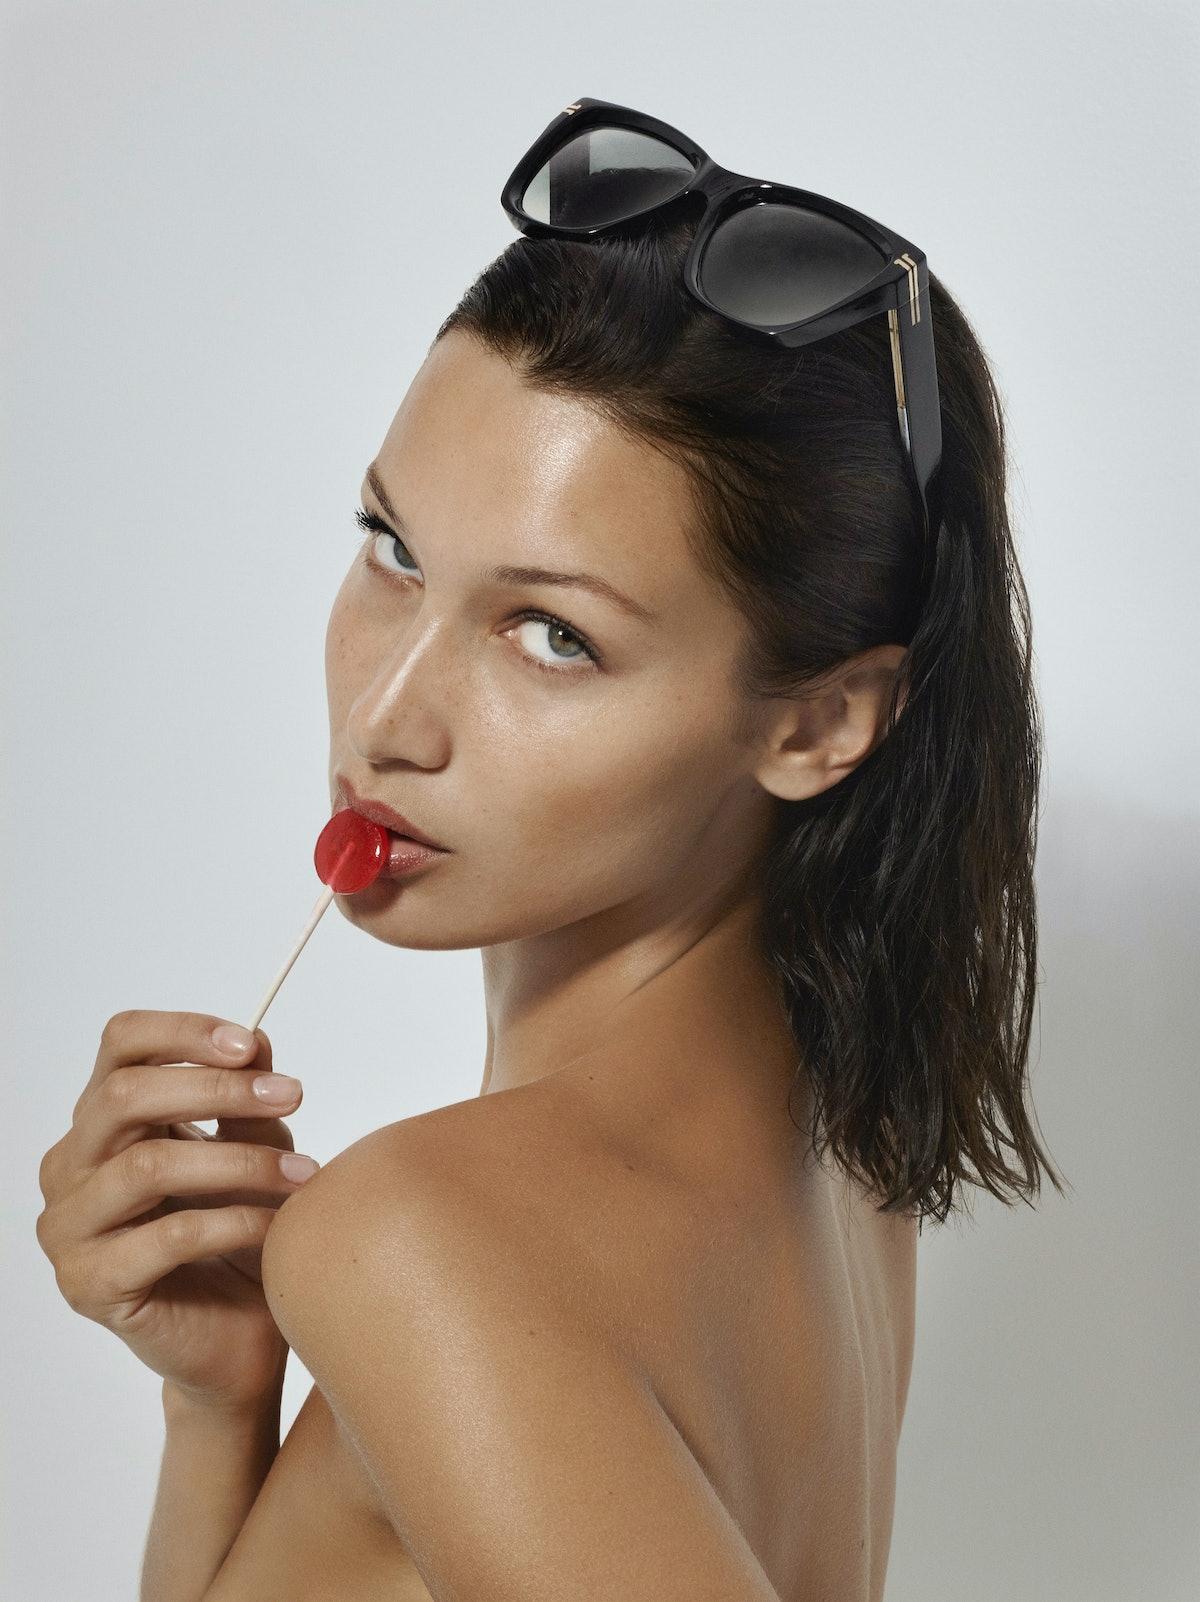 Bella Hadid holding a lollipop